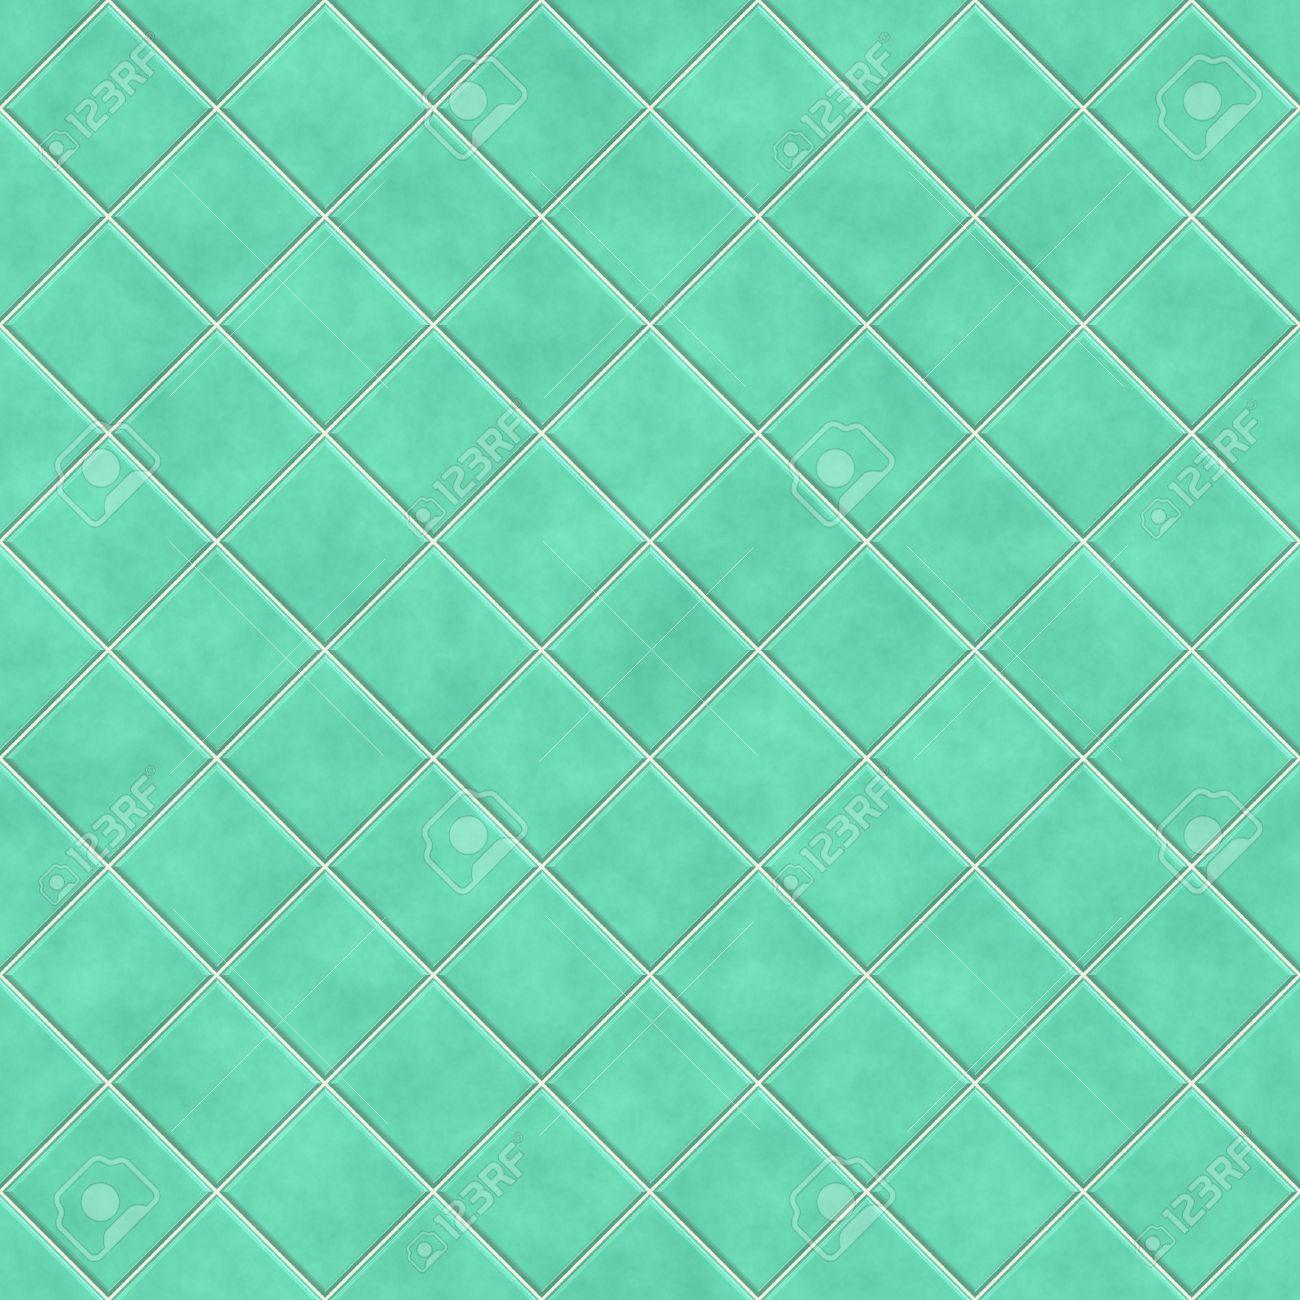 Green tiles kitchen texture - Seamless Green Tiles Texture Background Kitchen Or Bathroom Concept Stock Photo 7306526